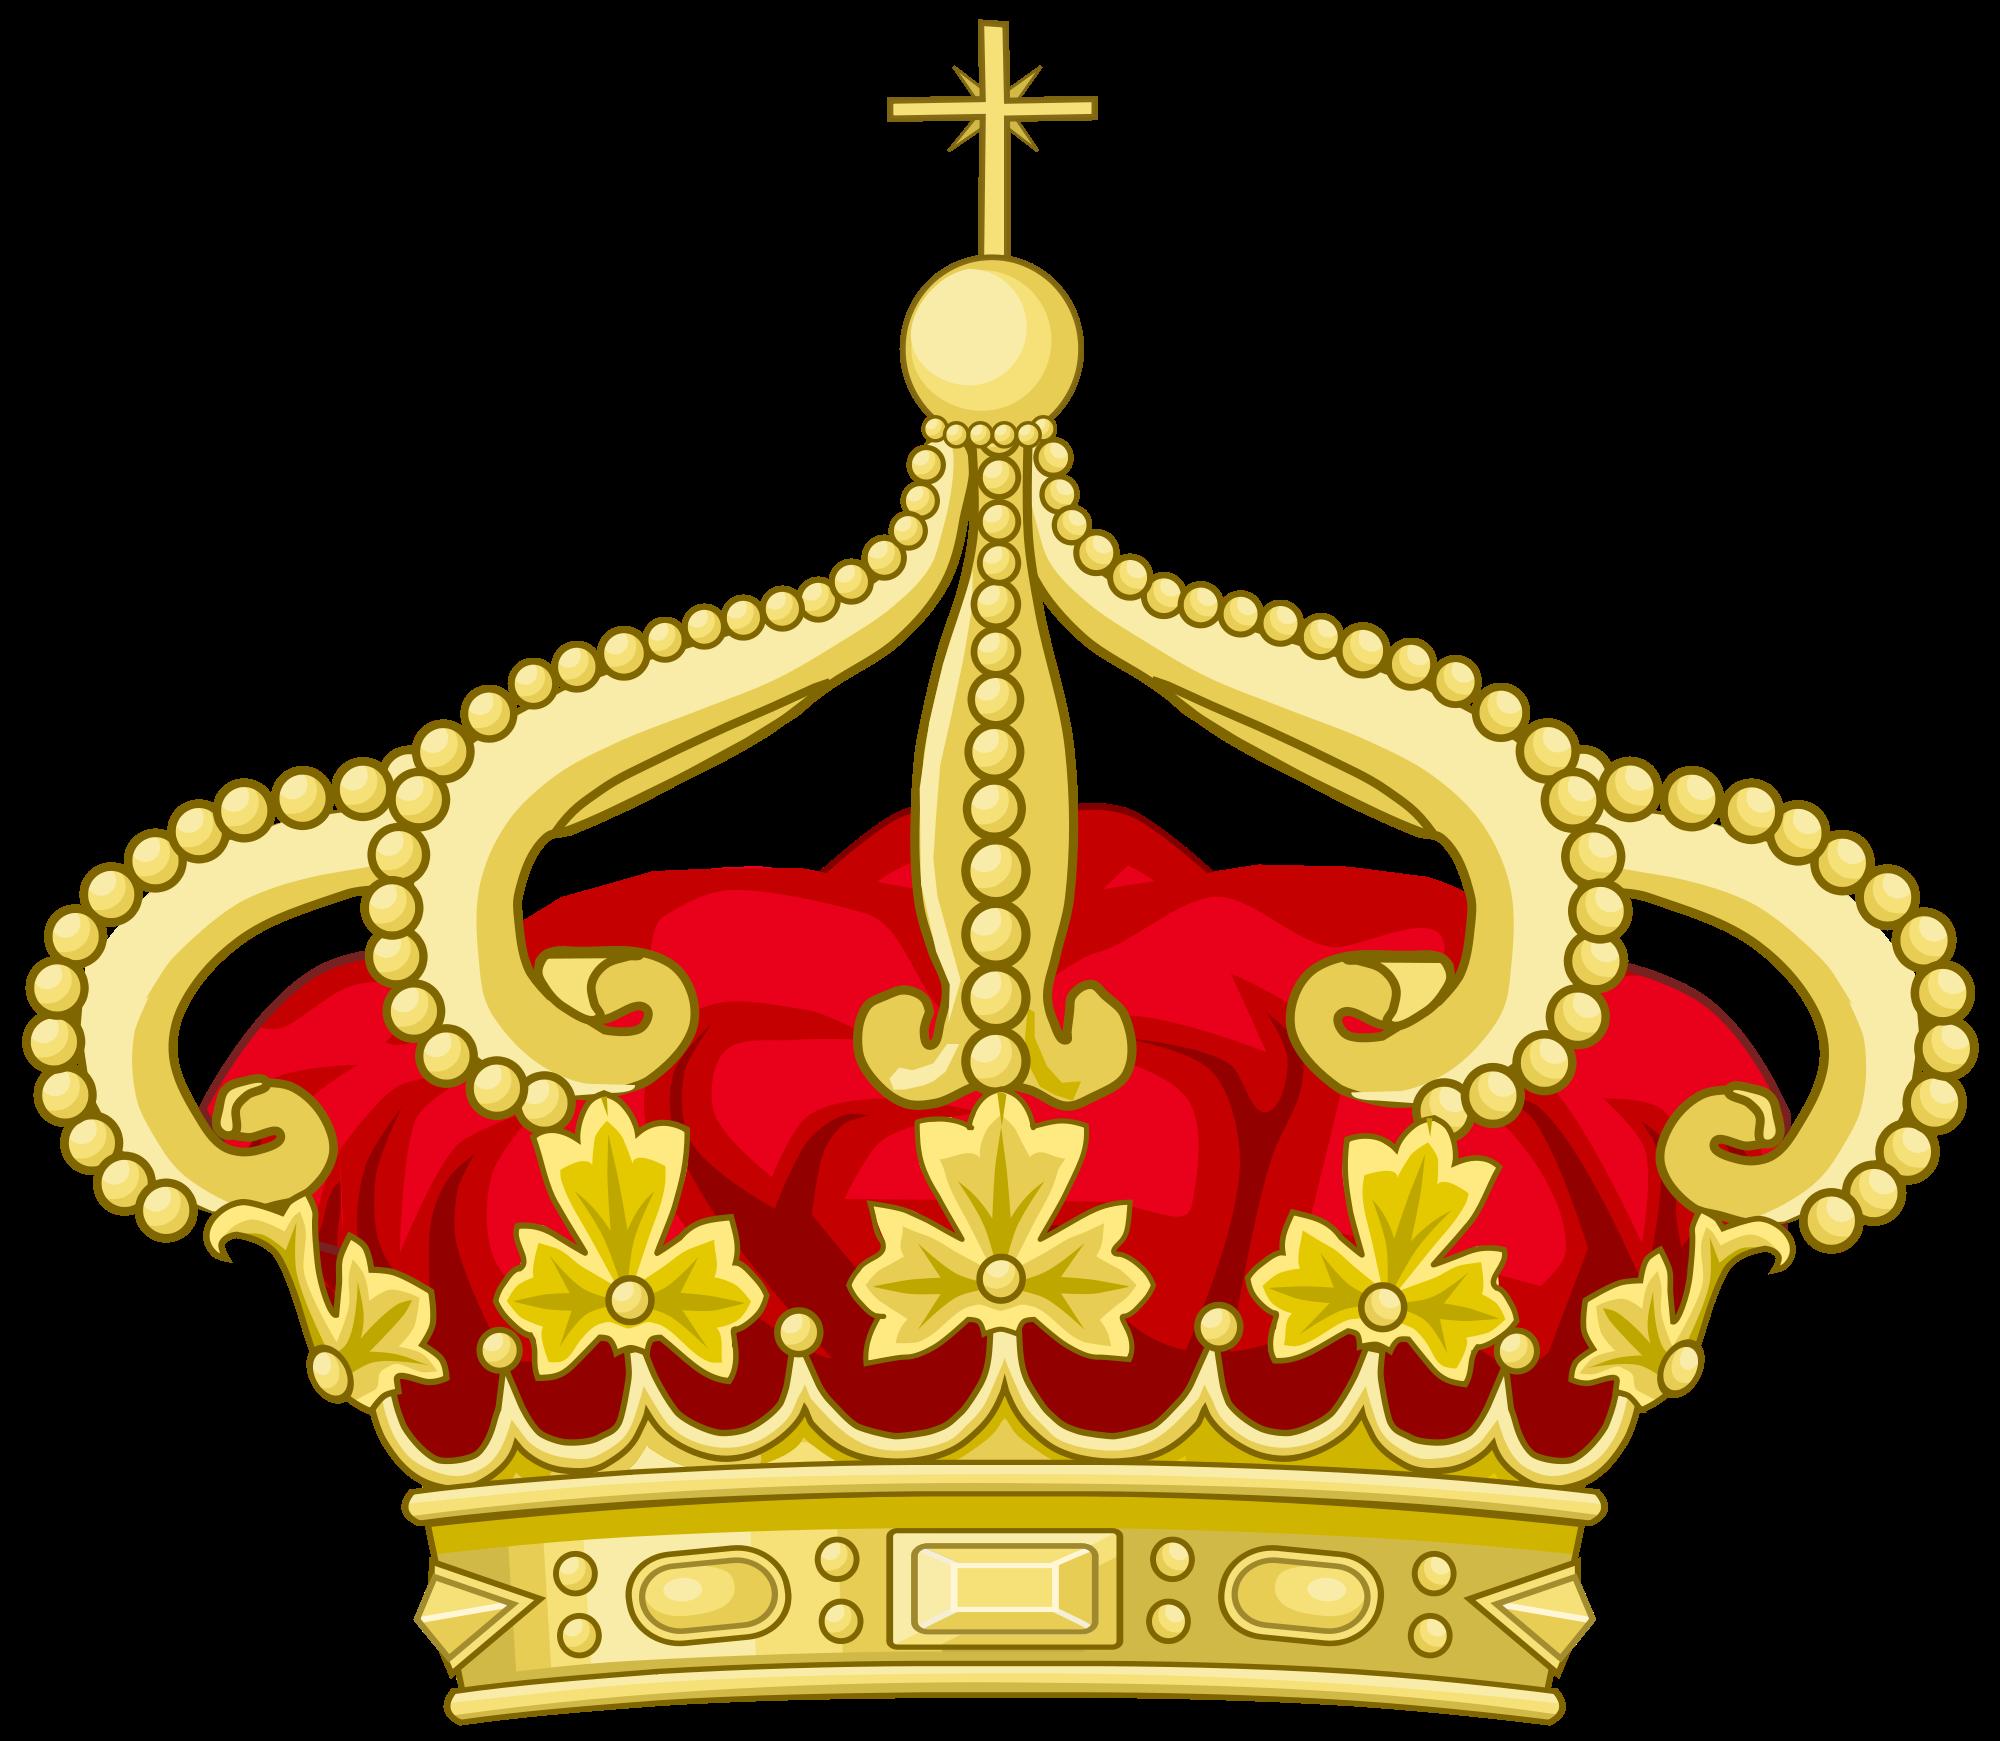 2000x1741 Fileroyal Crown Of Portugal.svg